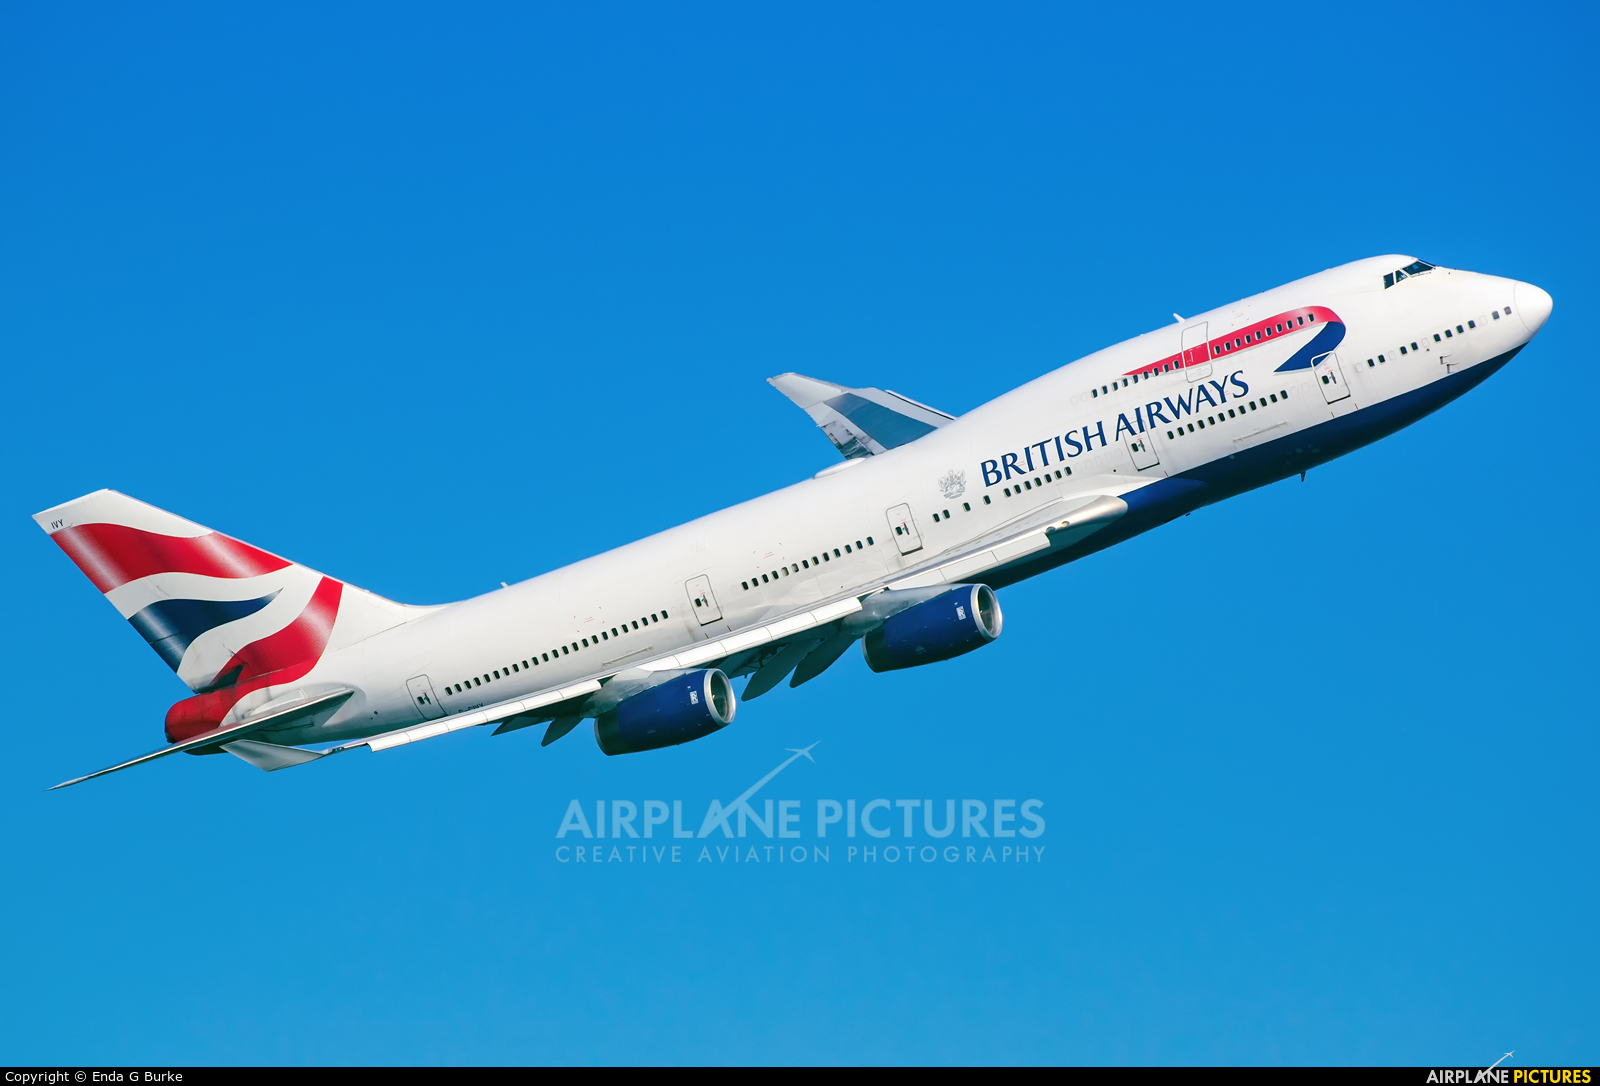 British Airways G-CIVY aircraft at London - Heathrow